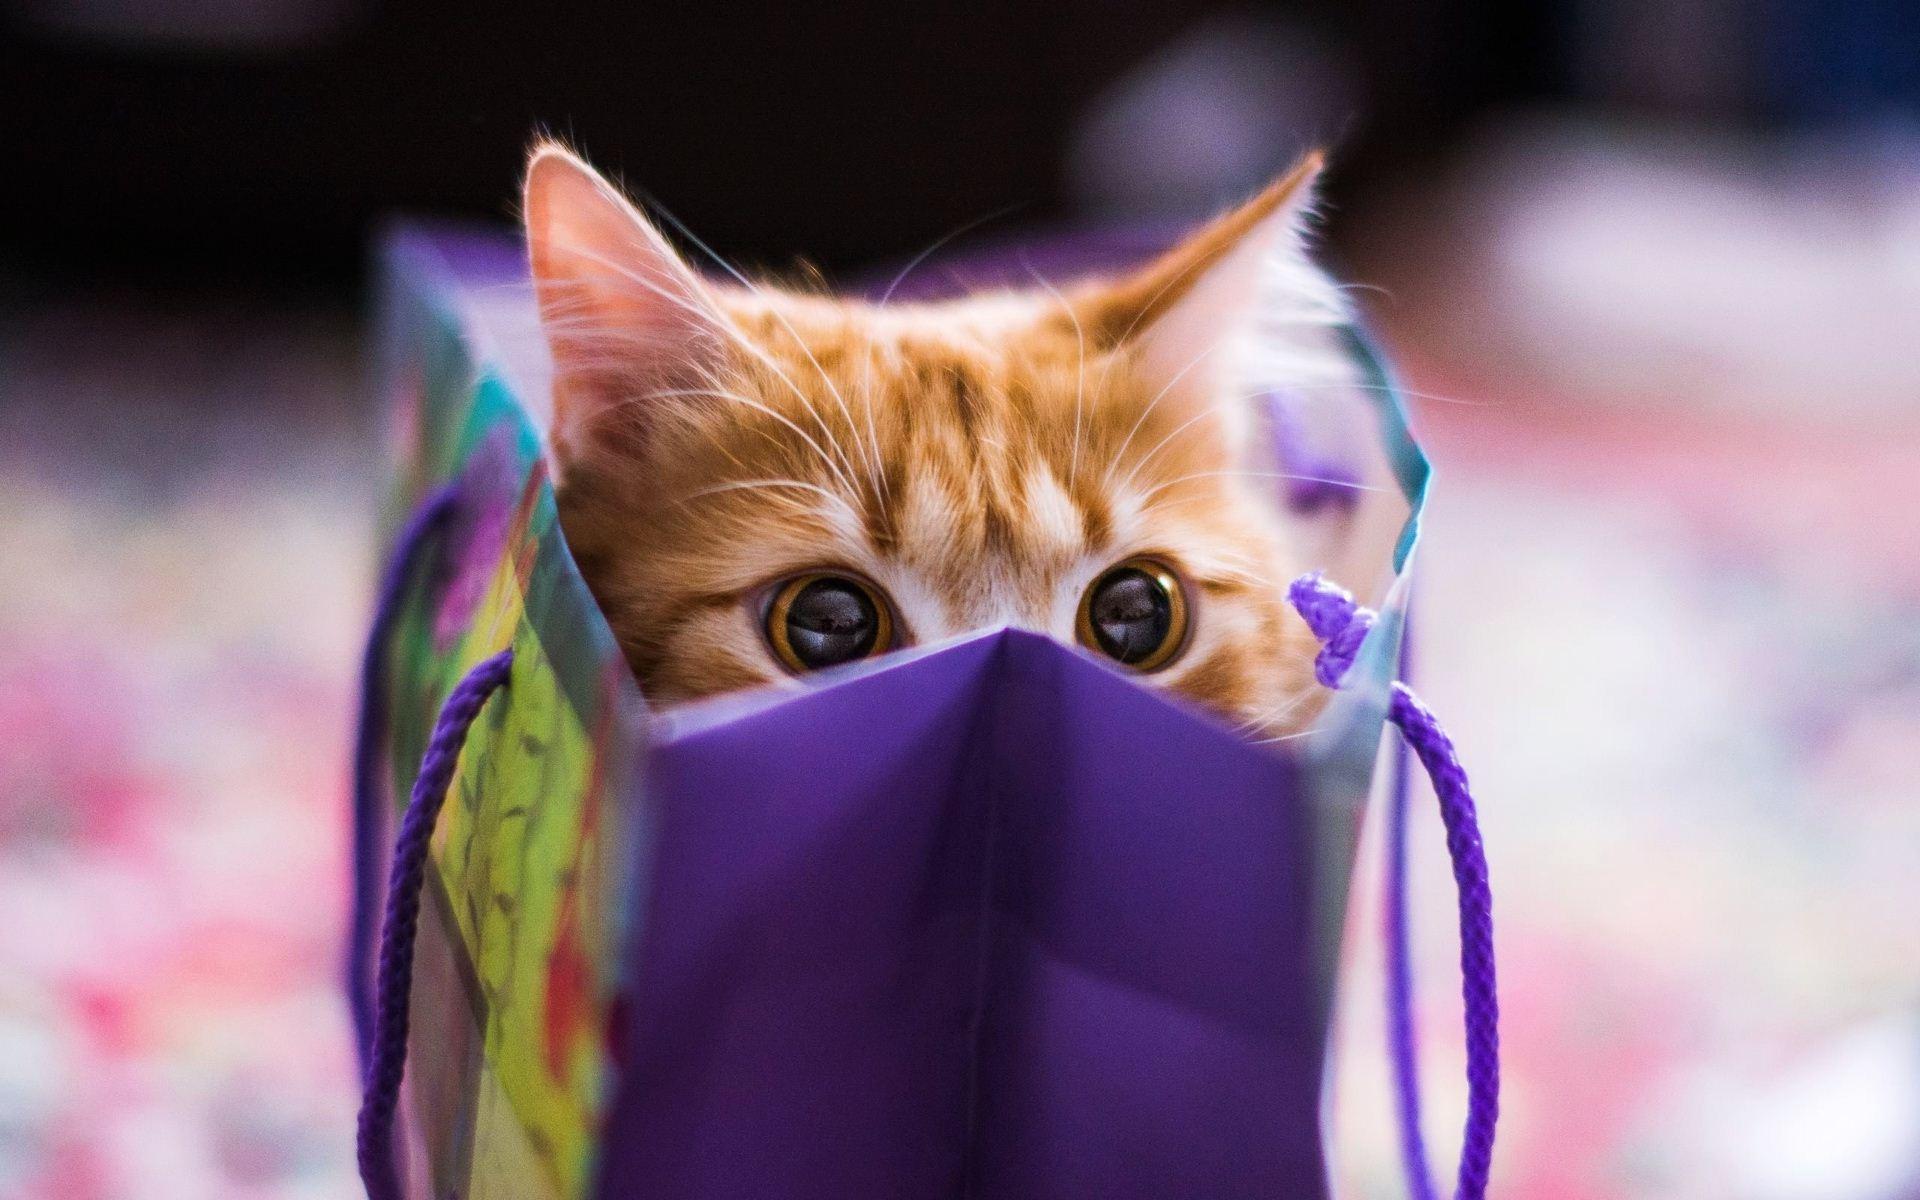 Download Adorable Cat Close Up Wallpaper 39680 1920x1200 px High ...